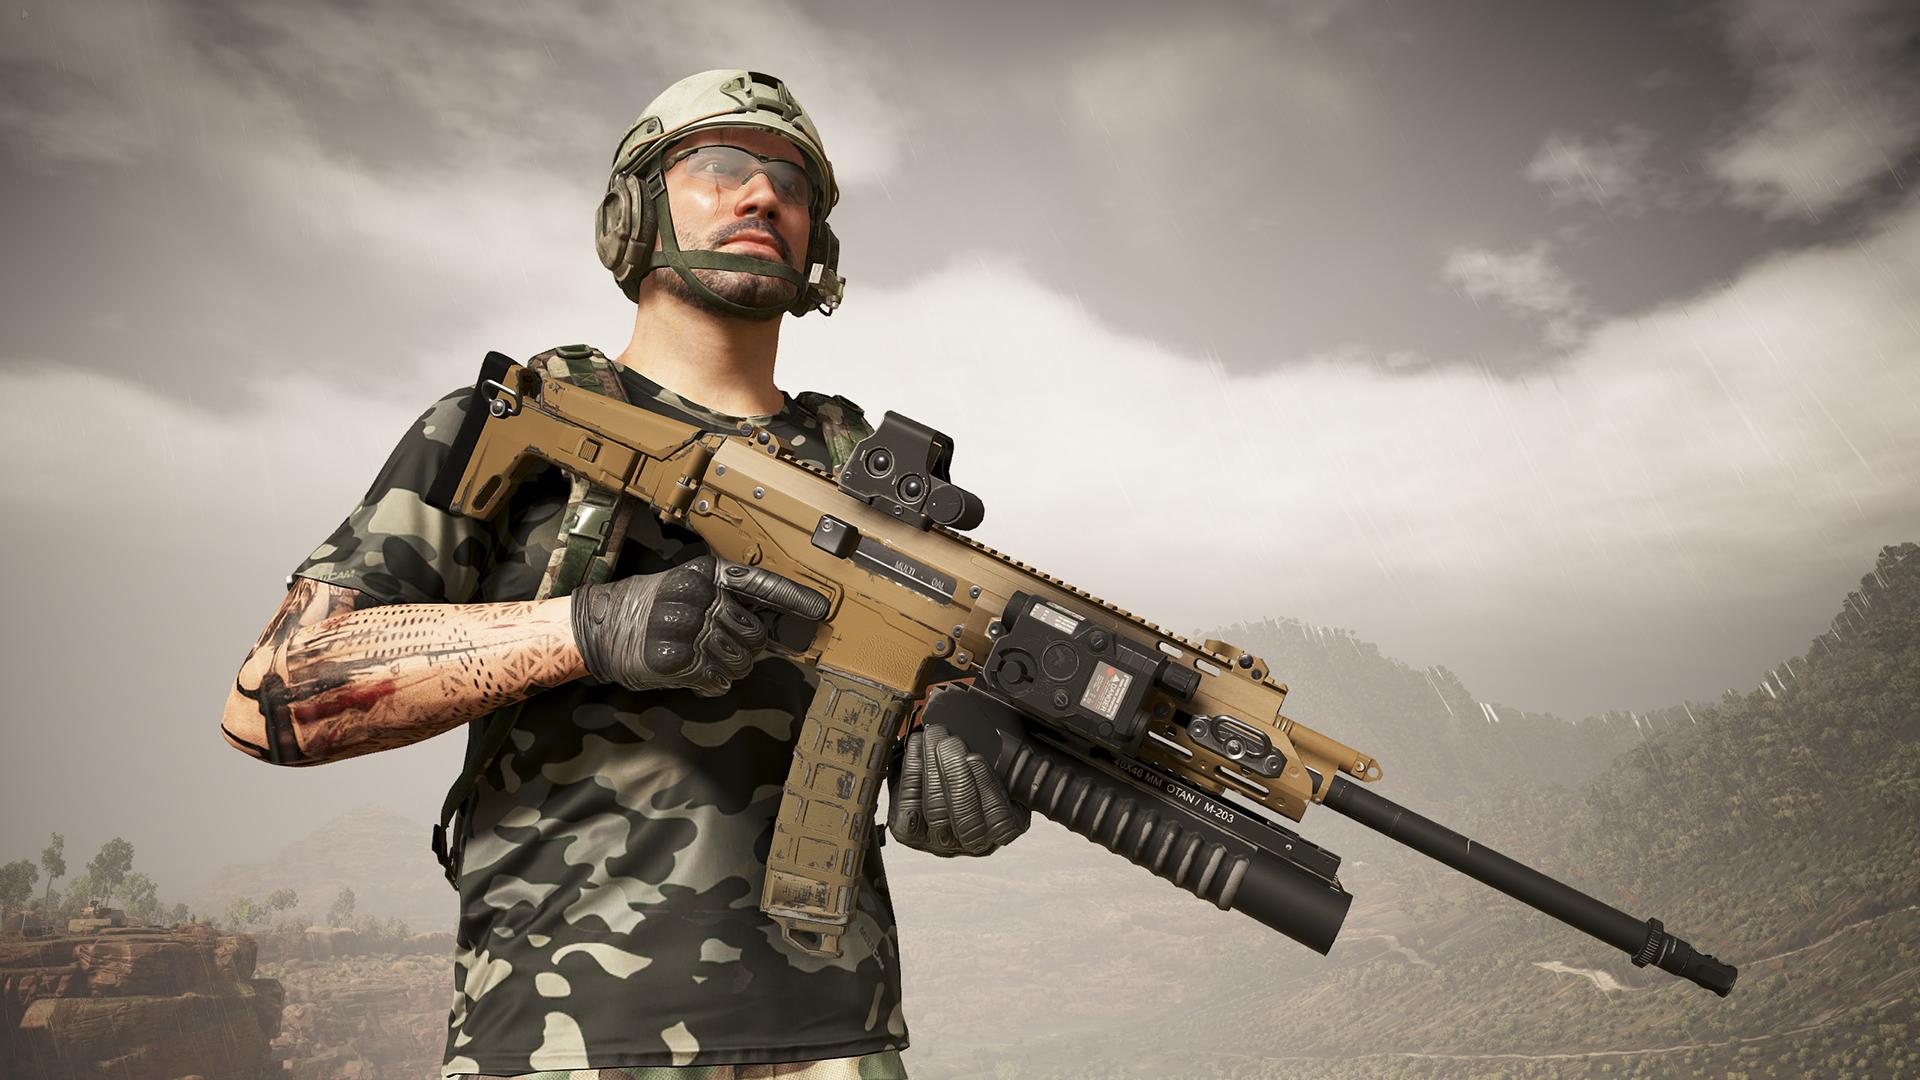 Assault Rifle Fanatic